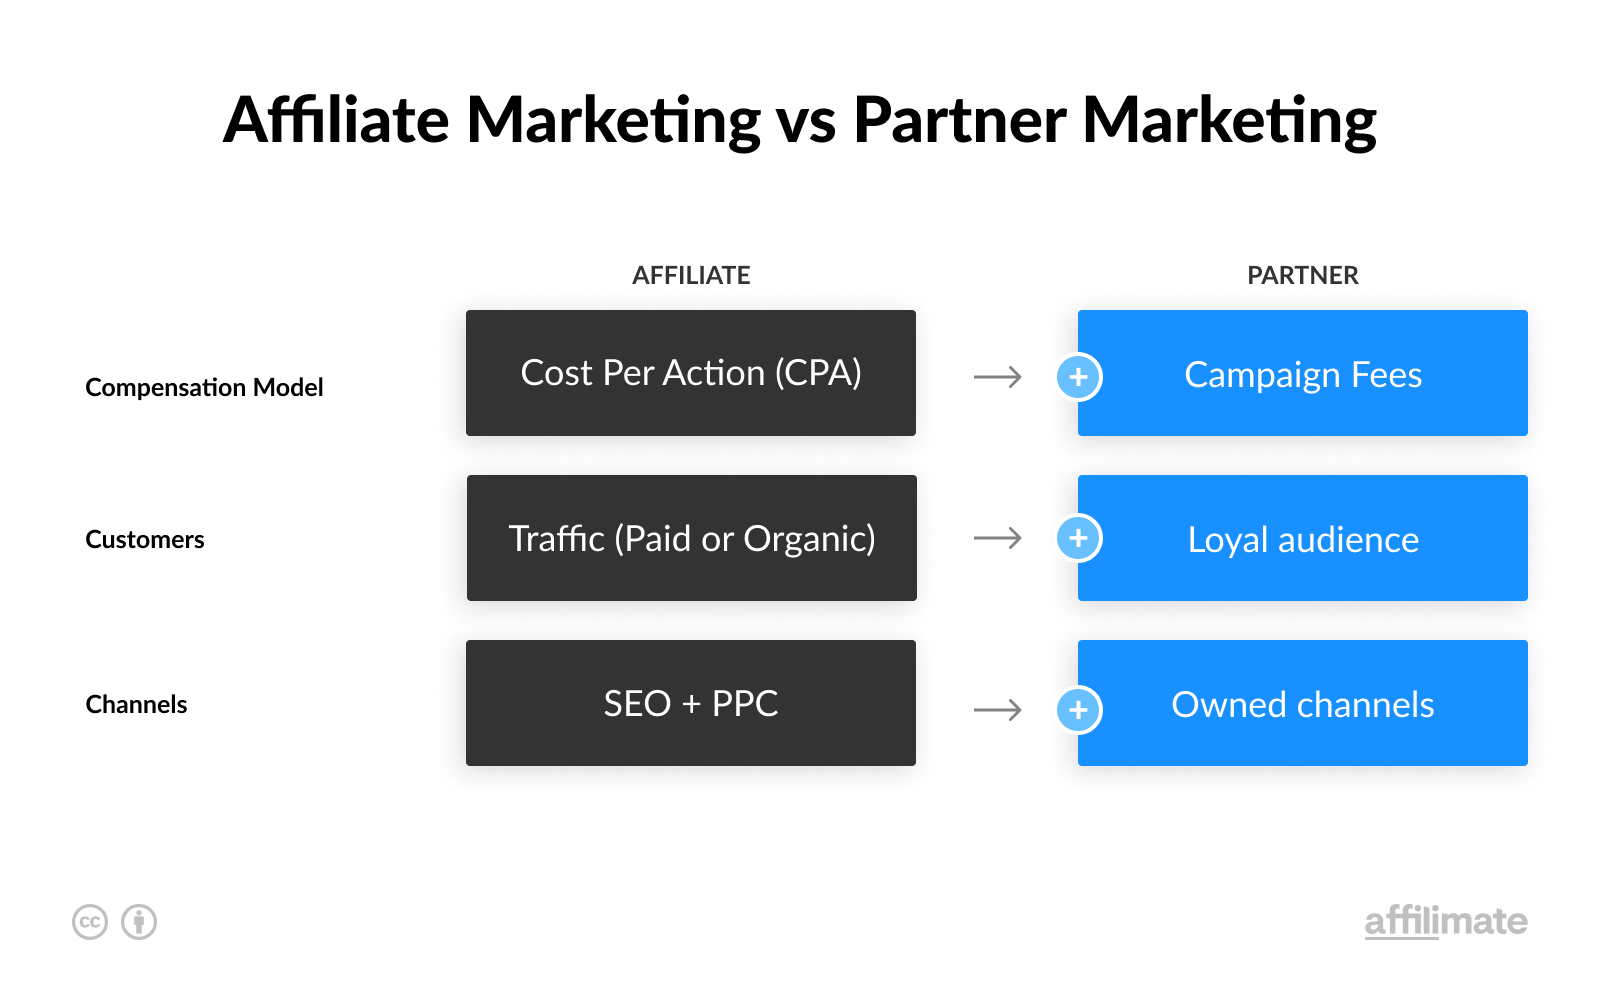 Affiliate Marketing vs Partner Marketing